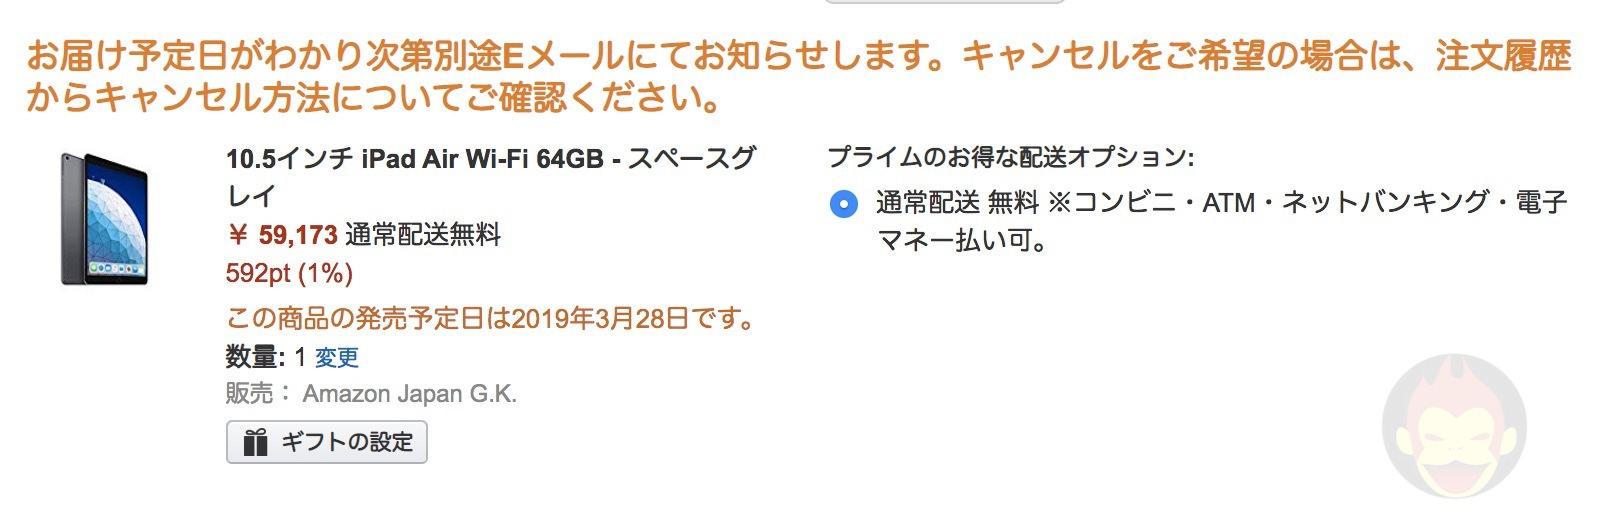 New-iPad-Air-on-Sale-at-Amazon-Preorder-01.jpg